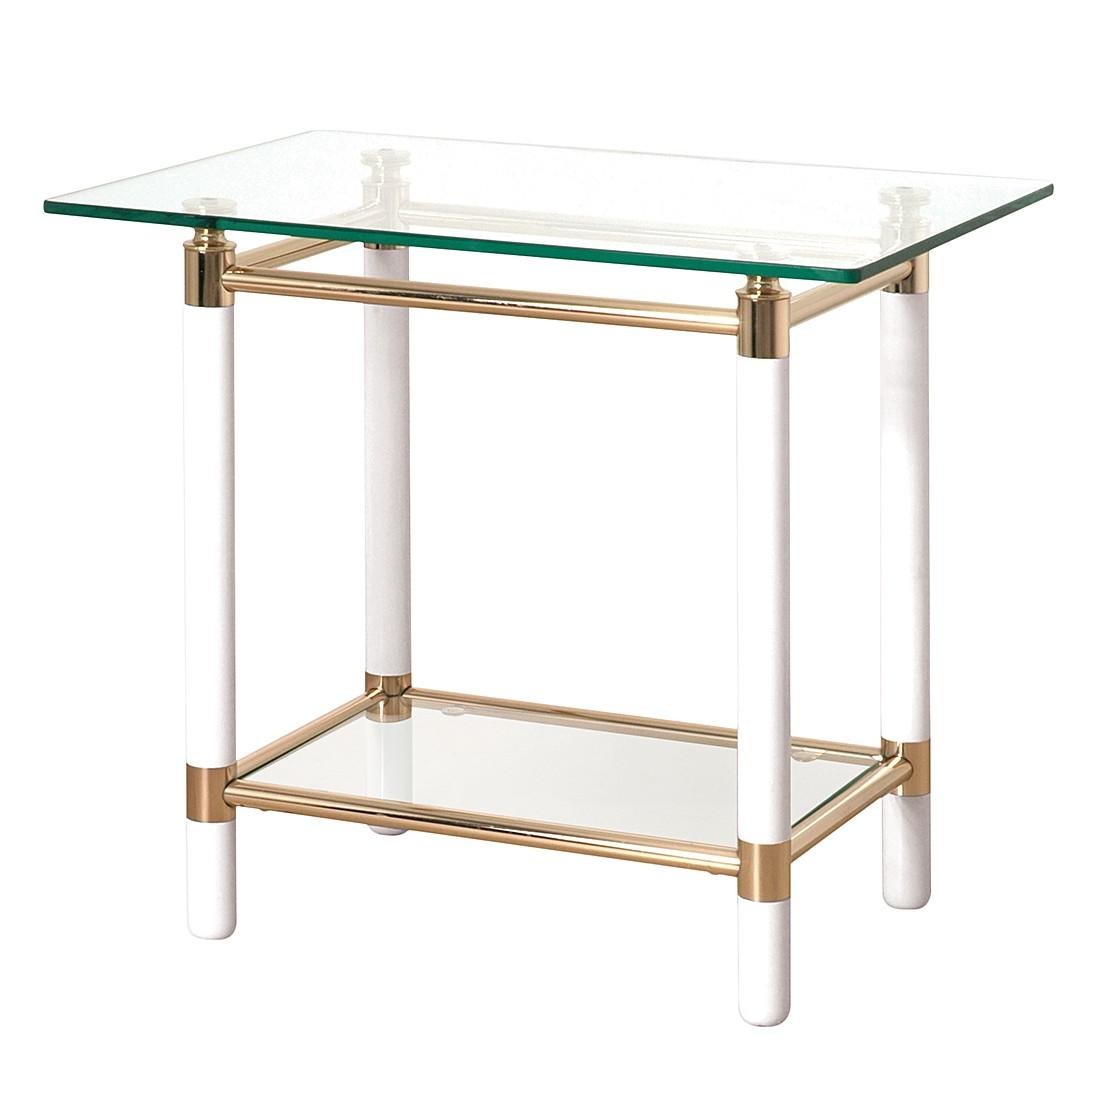 Table d'appoint Moselle II - Acier / Bois massif - Plaqué or / Blanc brillant, Home Design